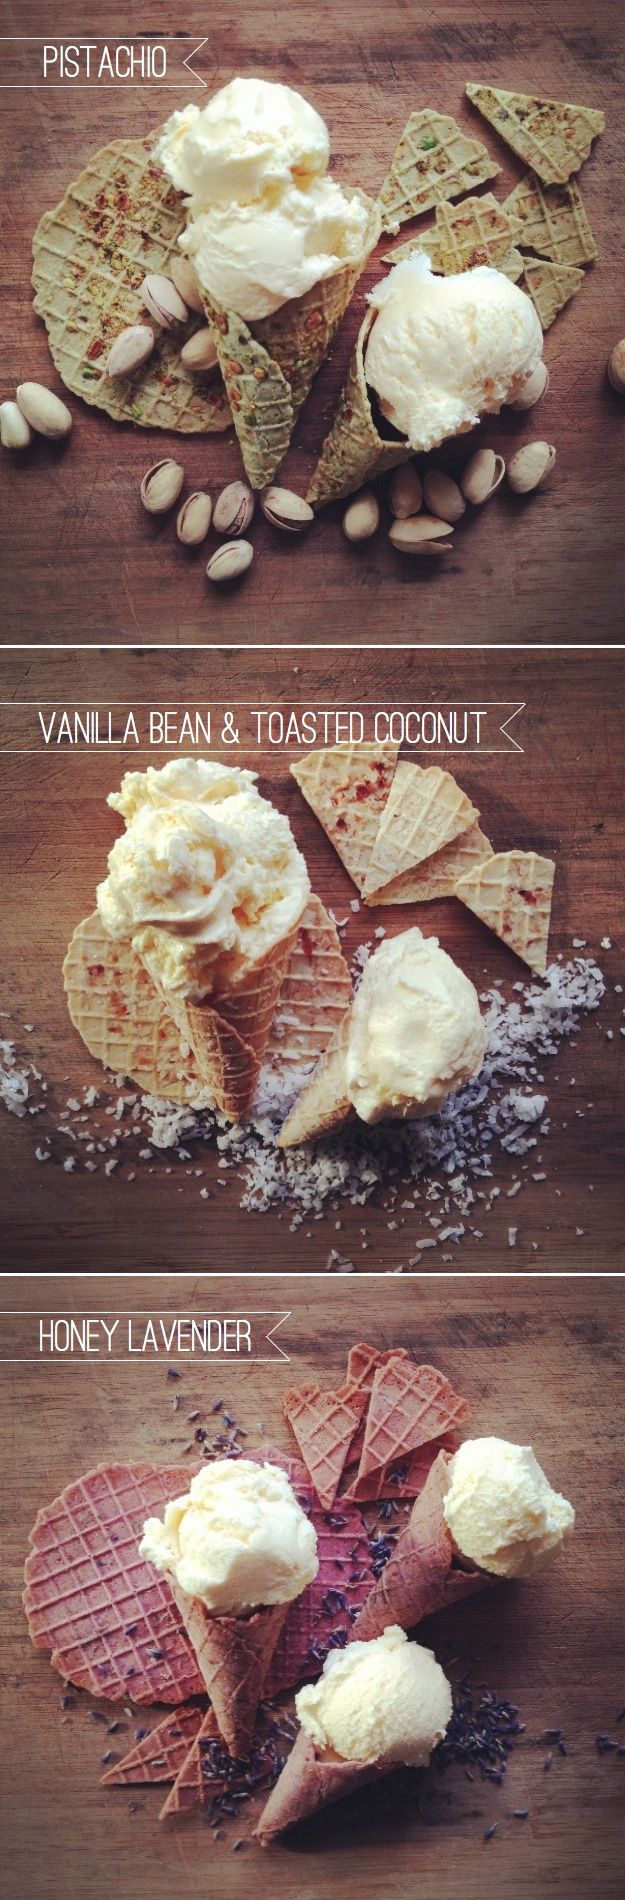 The Full Flavor Family: Sophisticated Ice Cream Cones